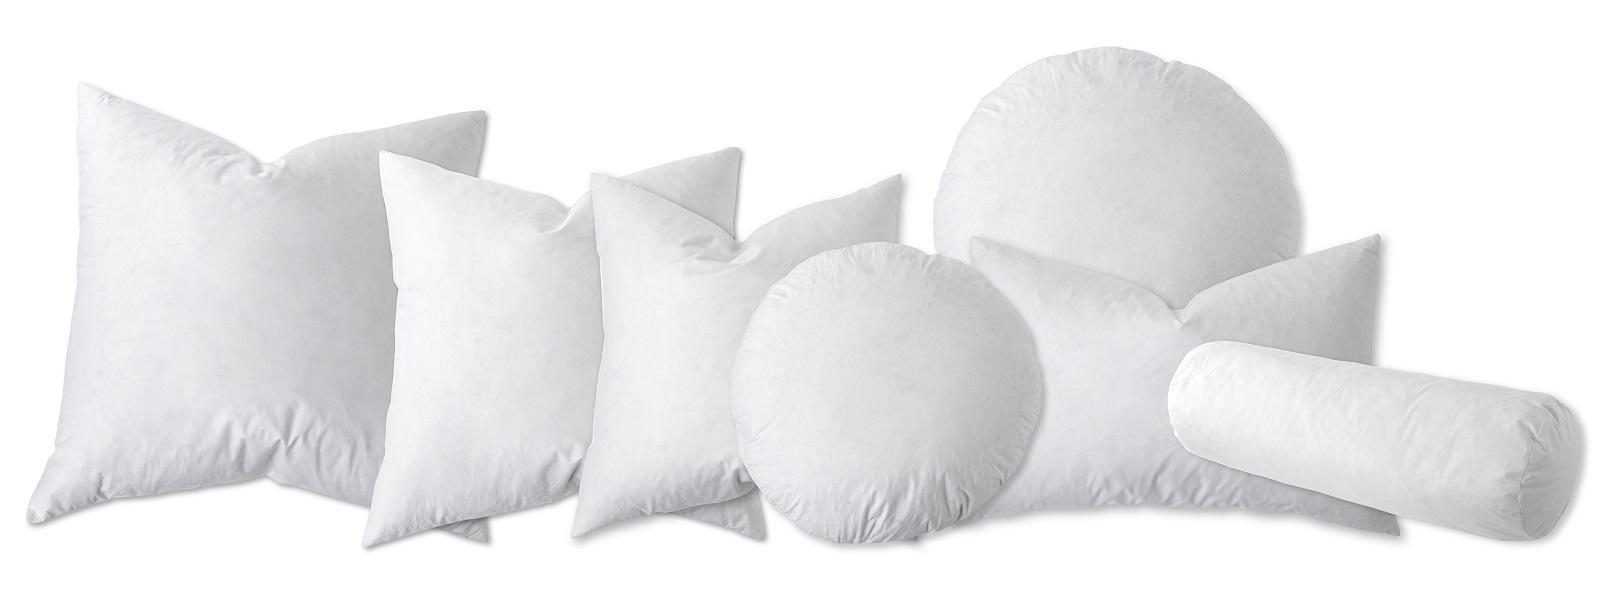 dec pillow inserts